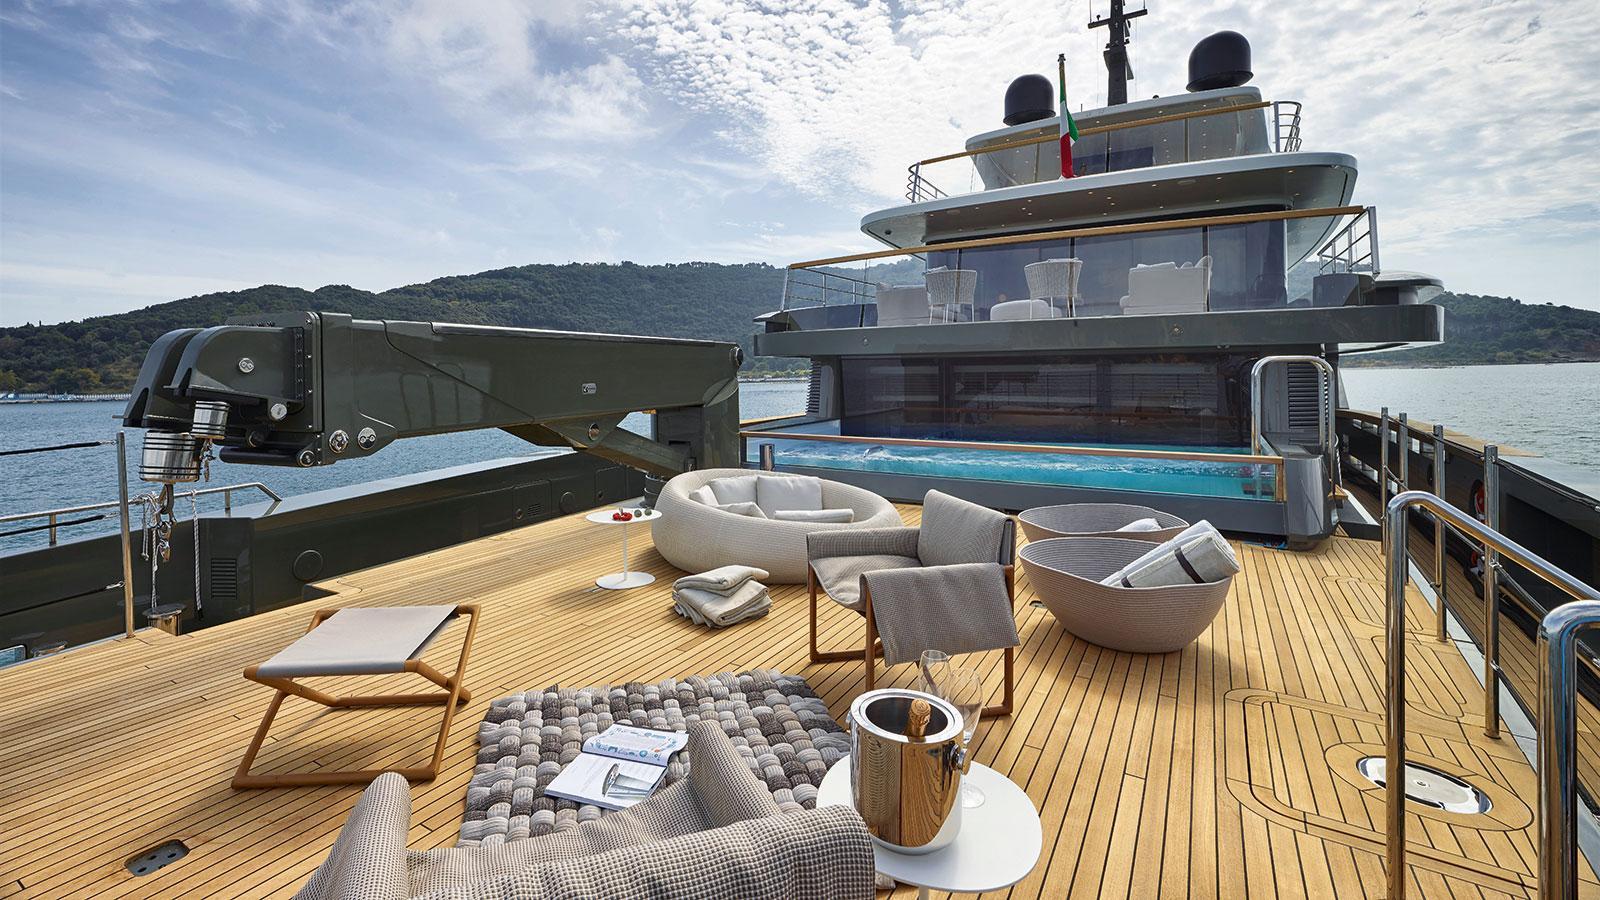 moka-expedition-motor-yacht-sanlorenzo-460-exp-2015-42m-sun-deck